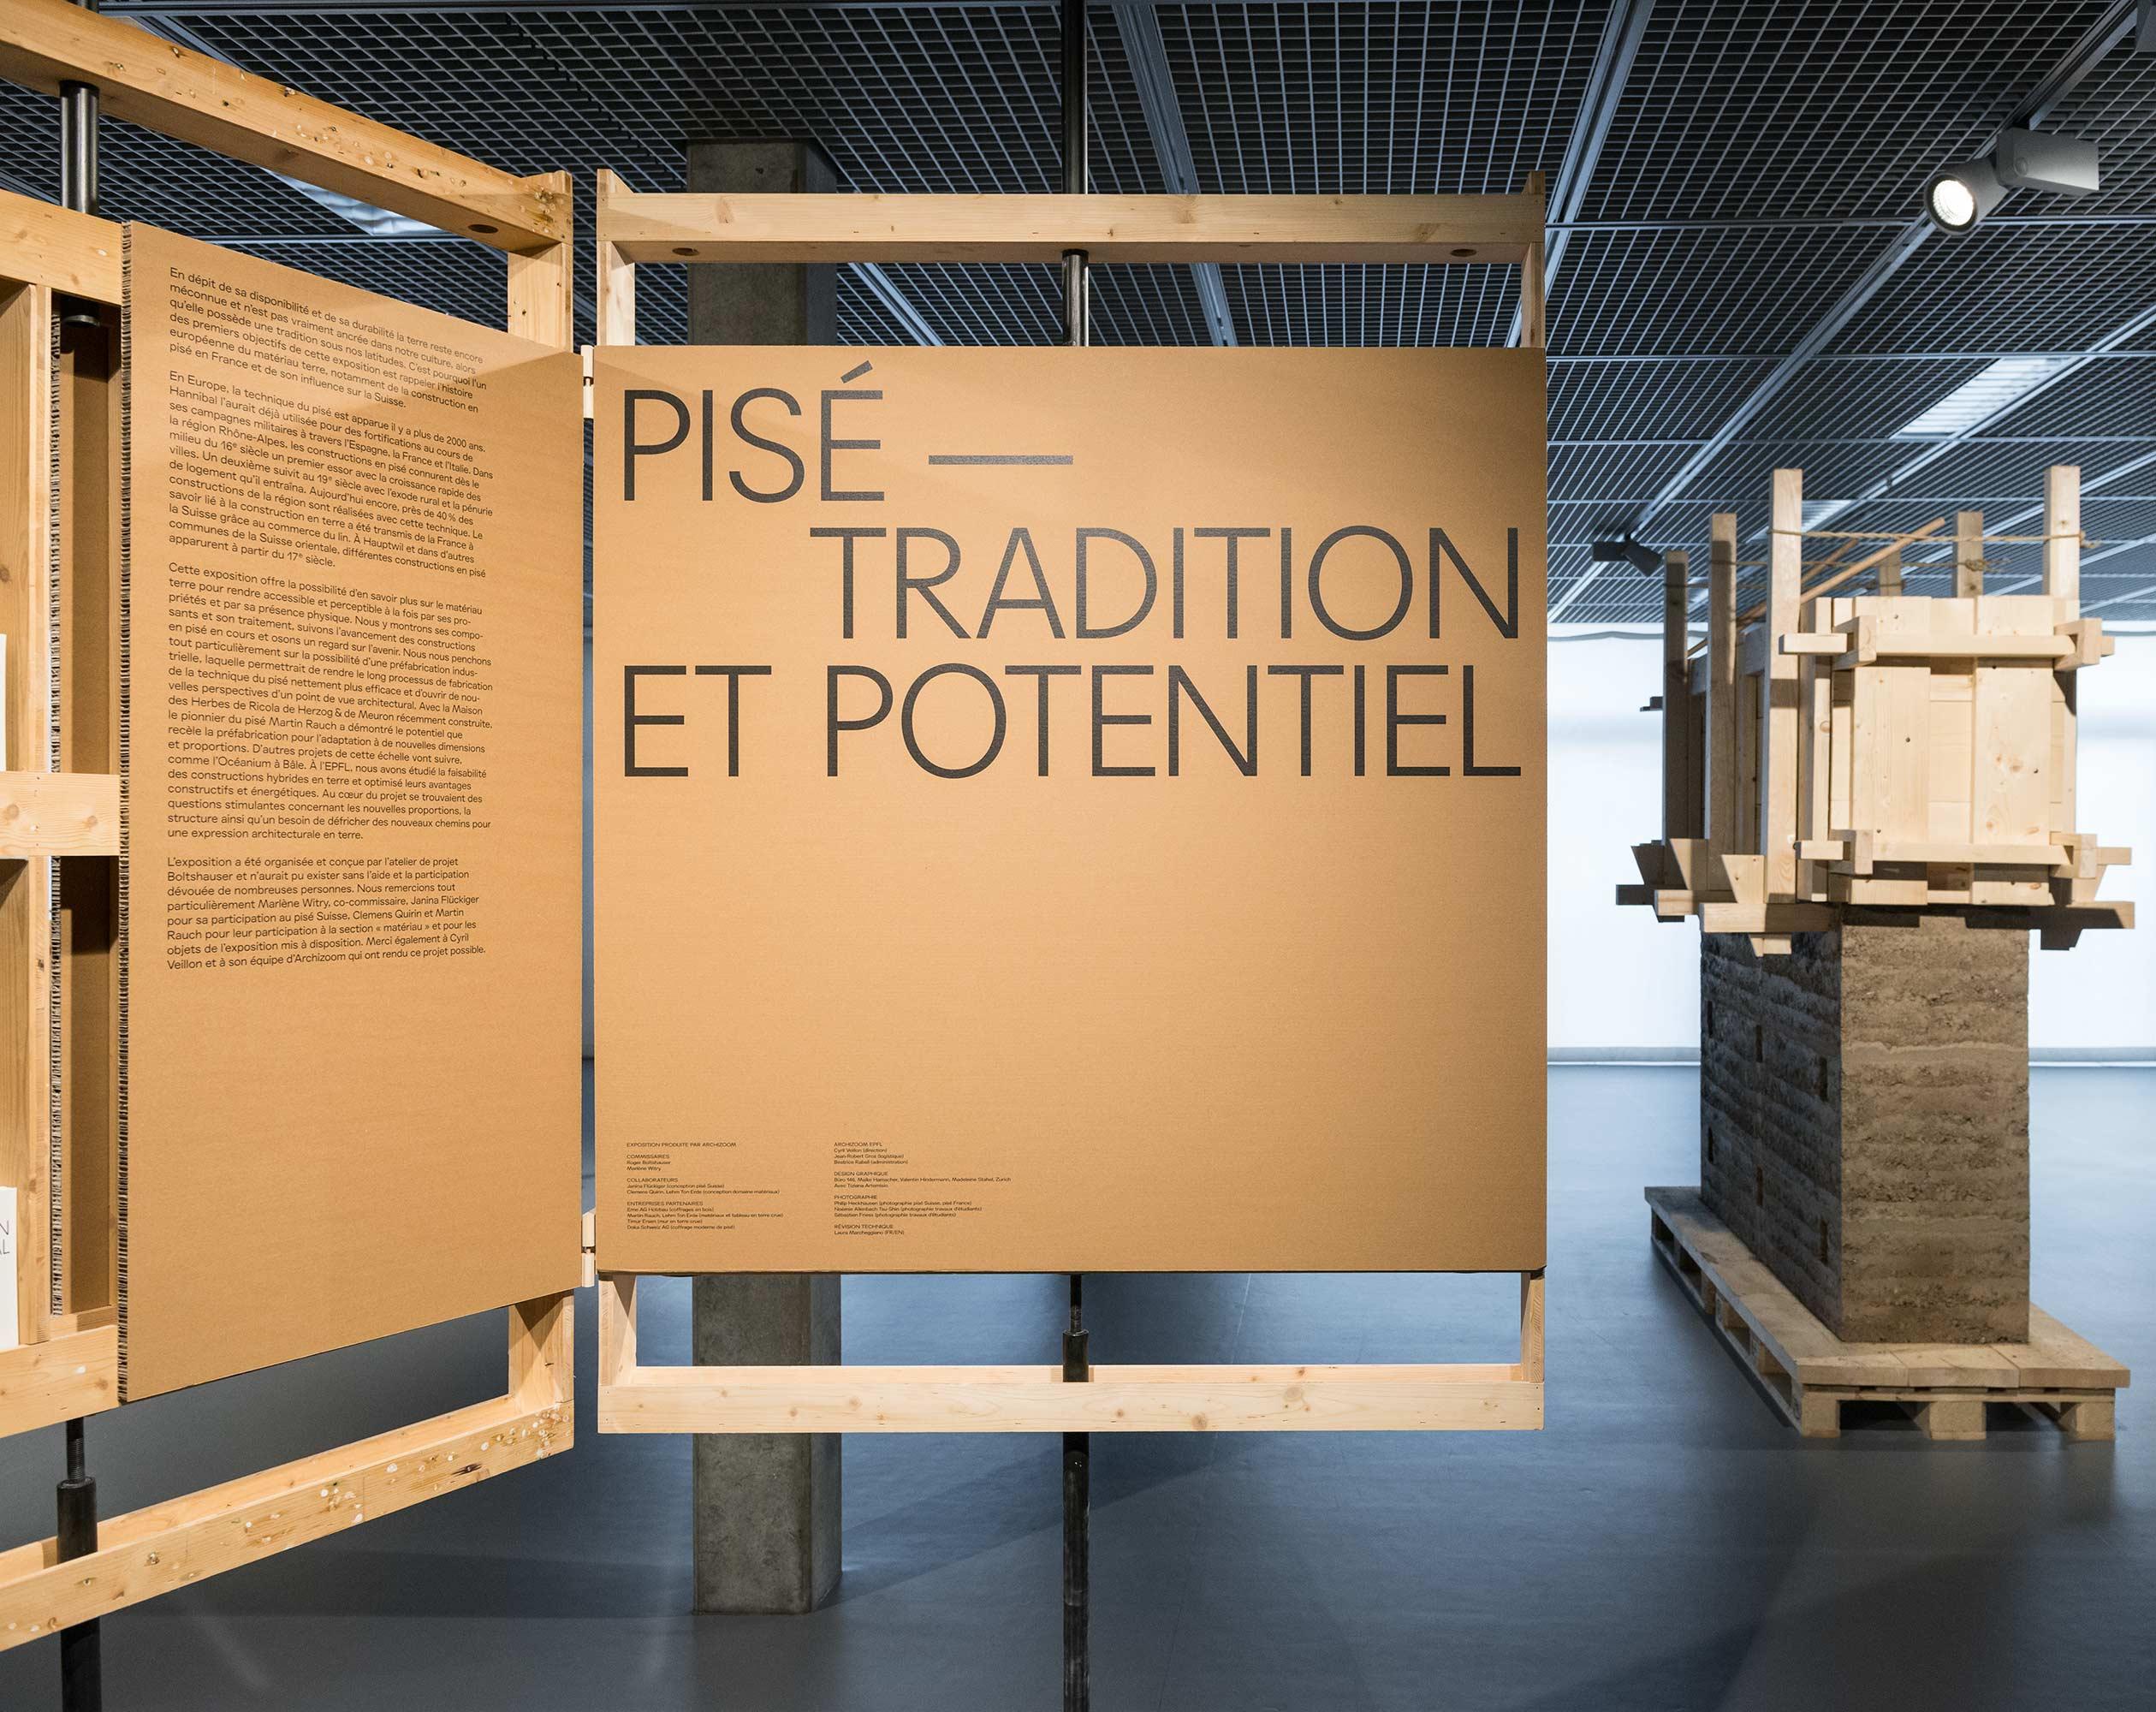 Pisé – Tradition und Potential  279/7